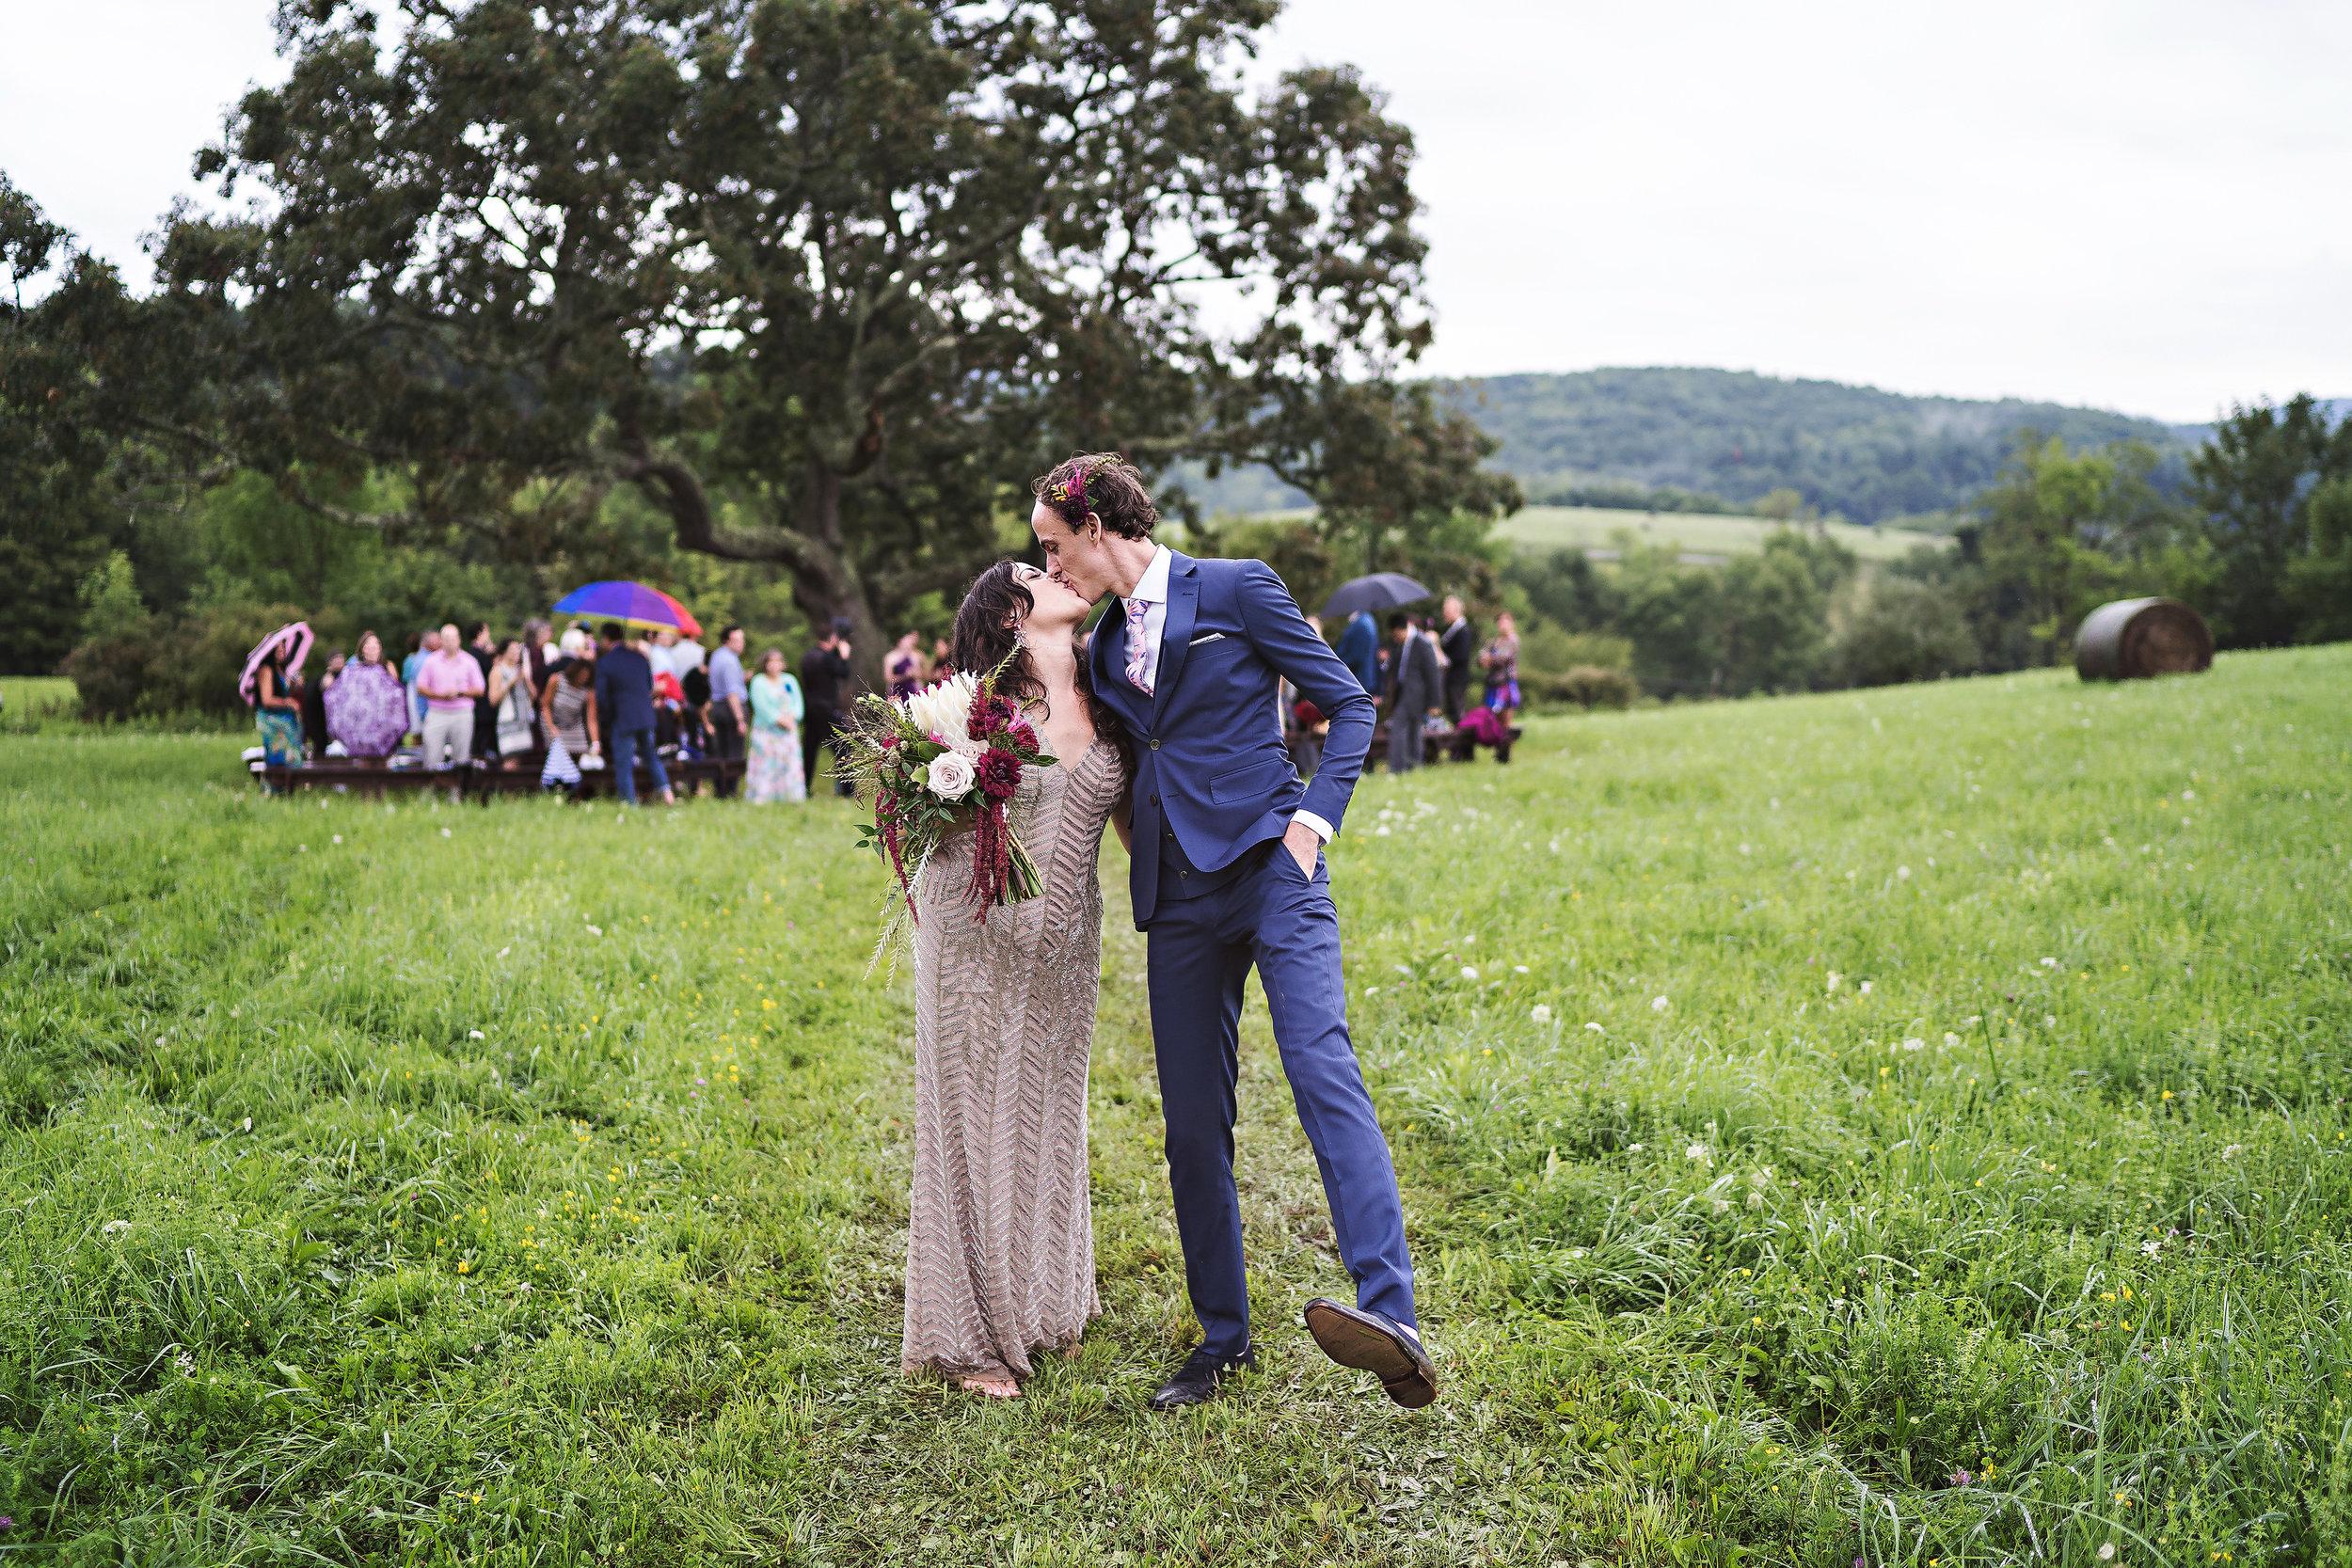 upstate New York rainy wedding